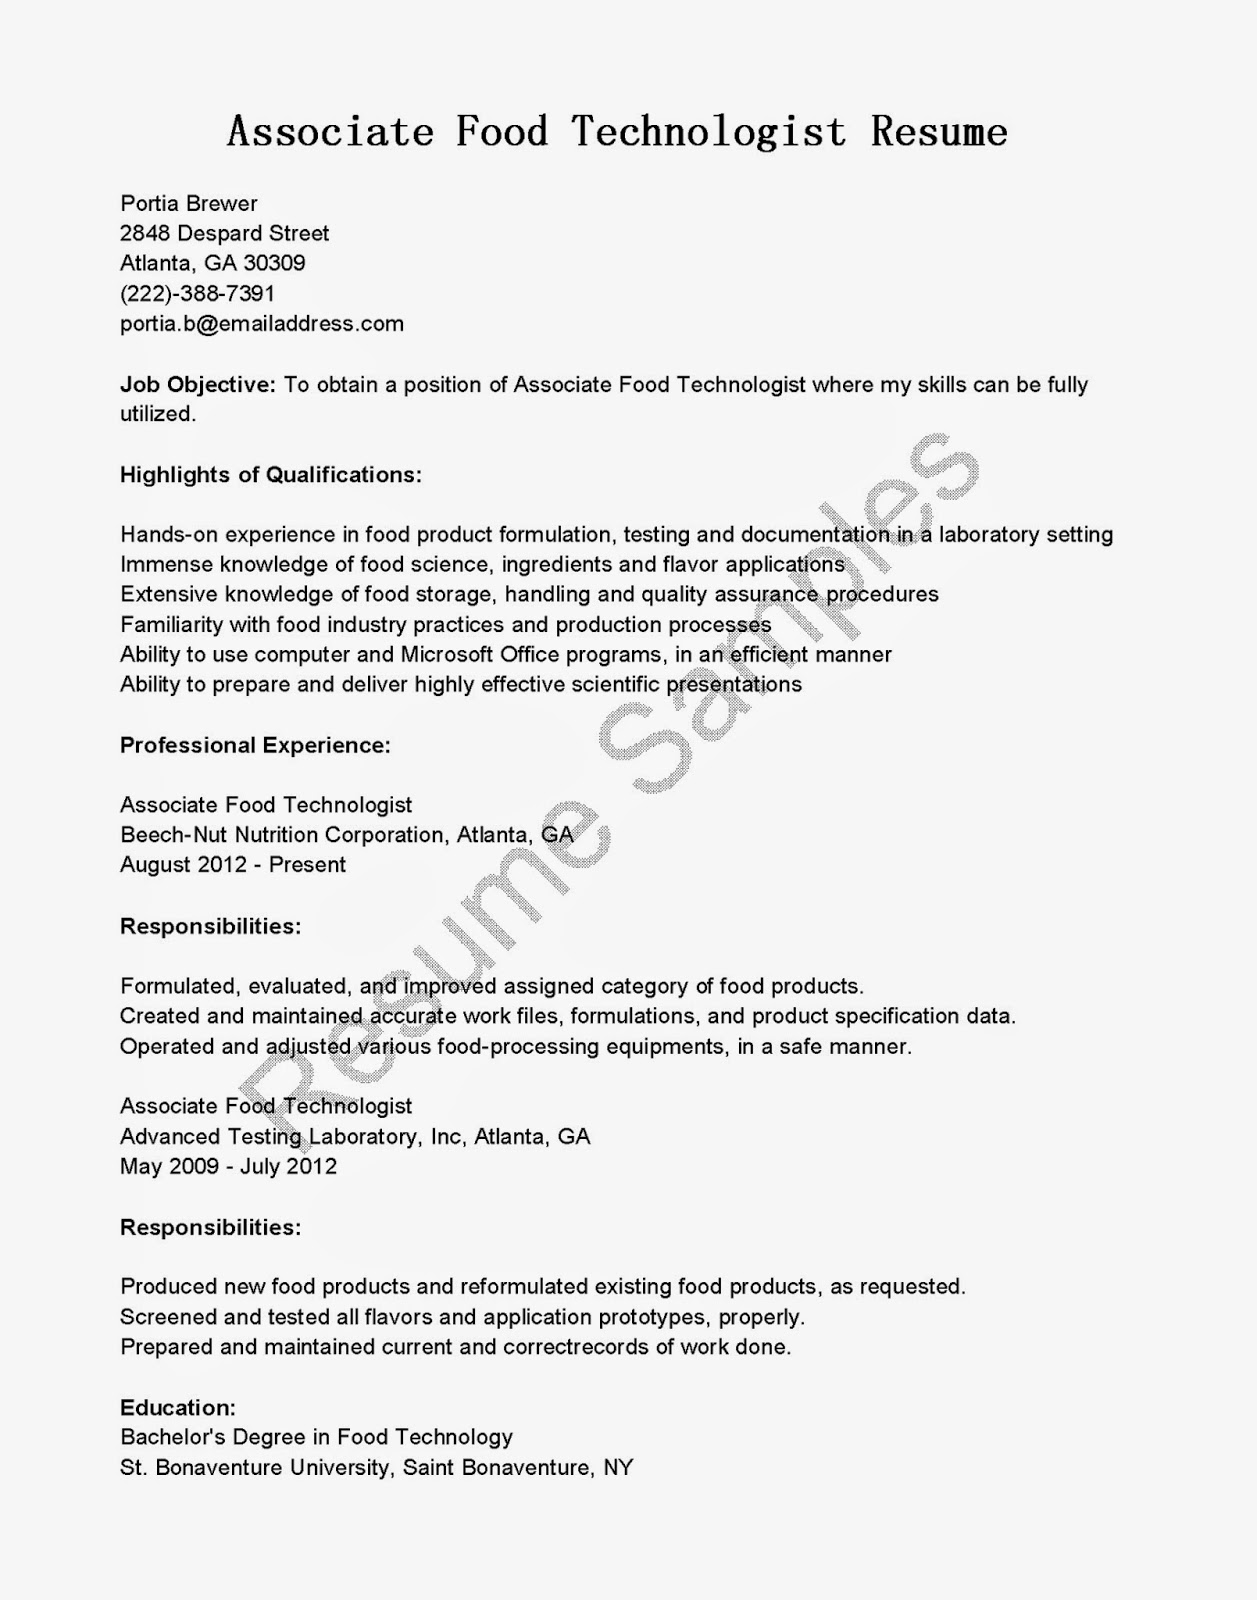 Resume Samples Associate Food Technologist Sample